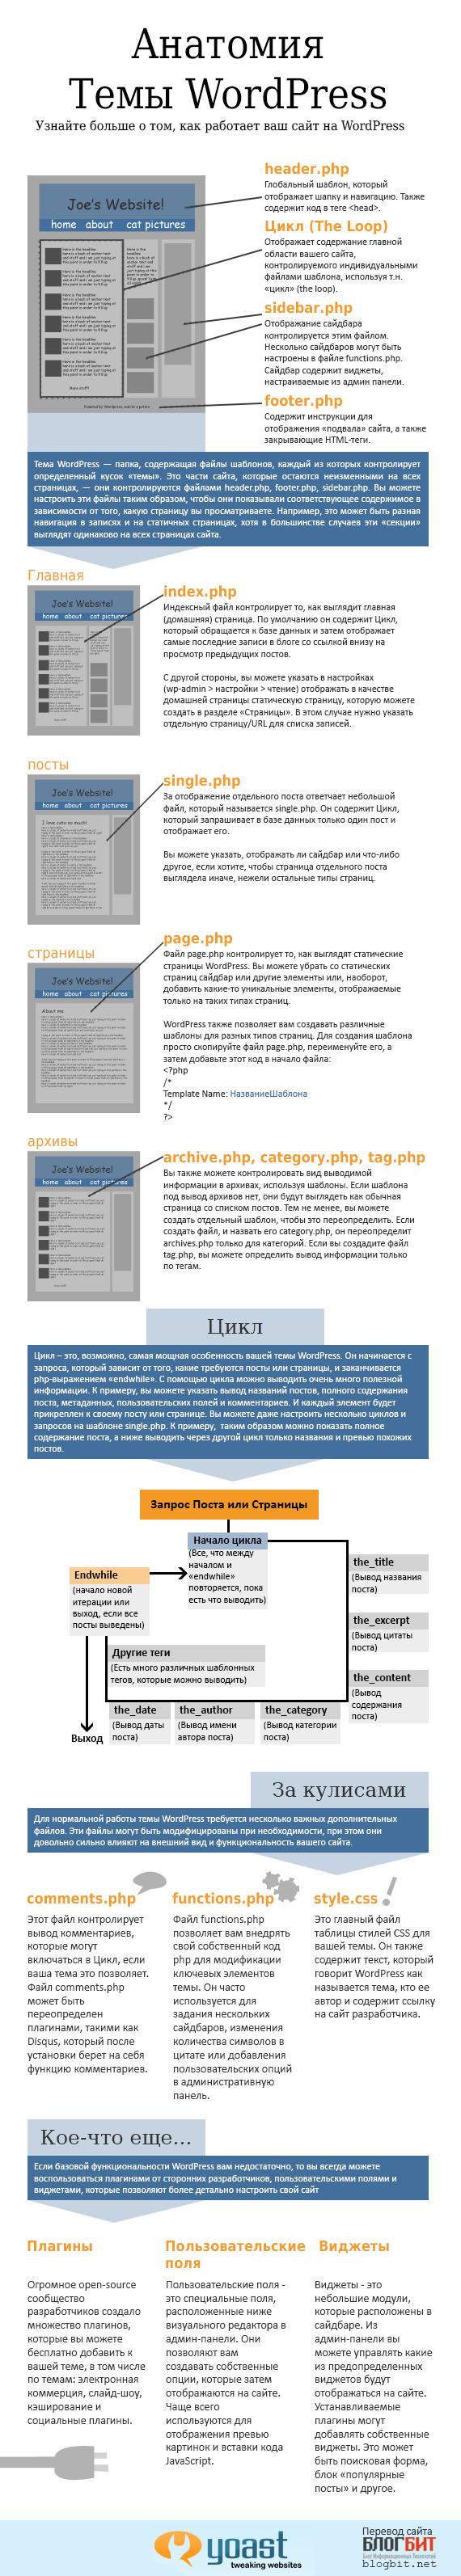 Анатомия темы WordPress - инфографика